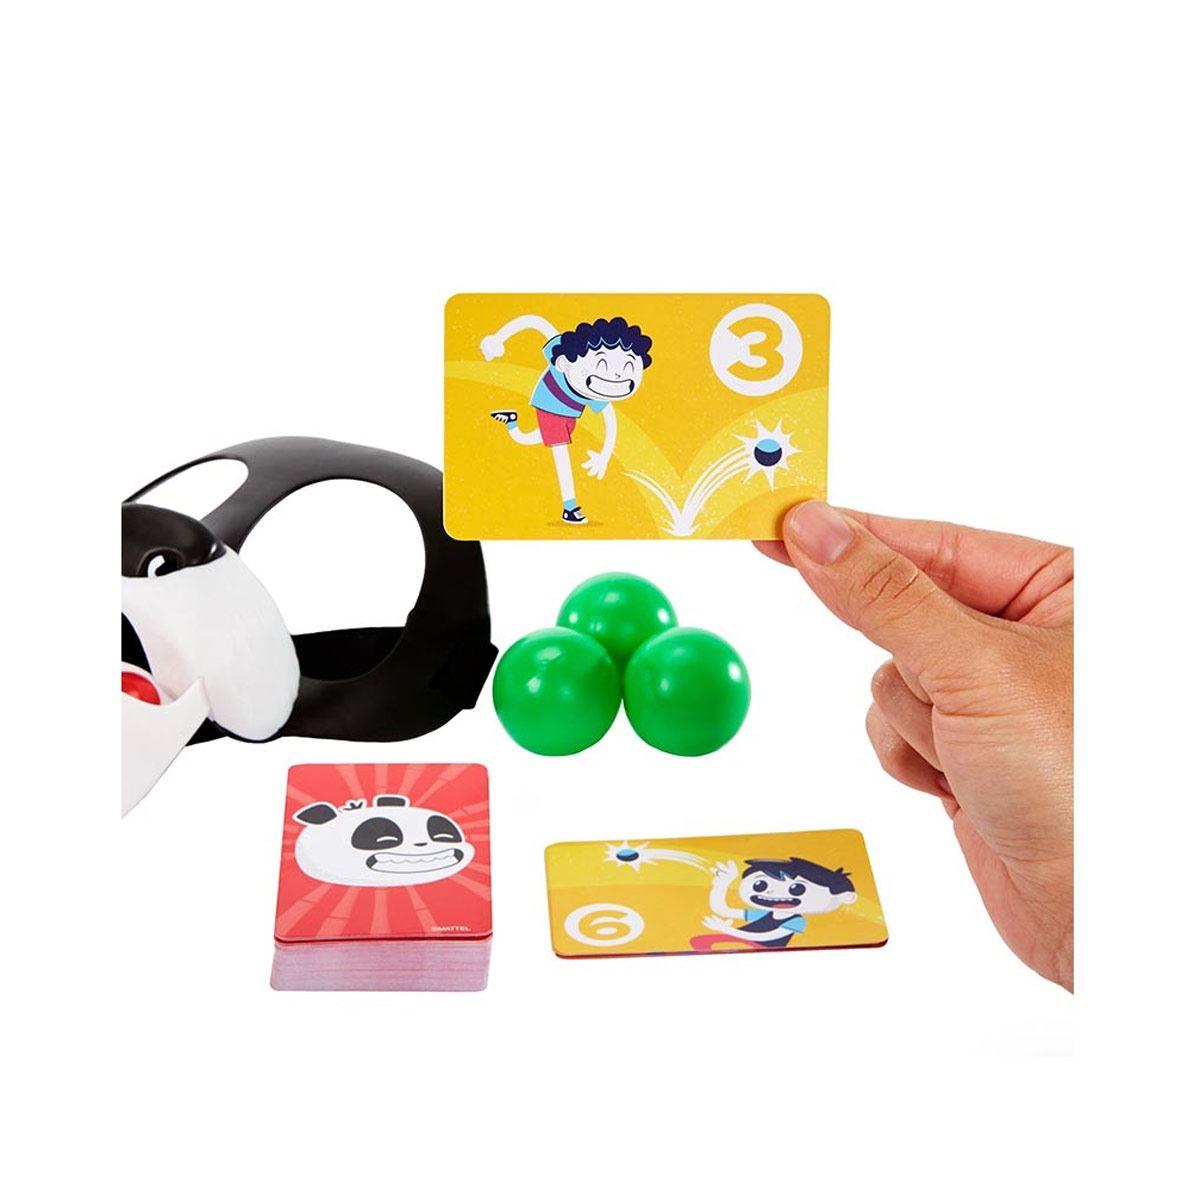 Juego de Mesa Mattel Come Panda Come Games